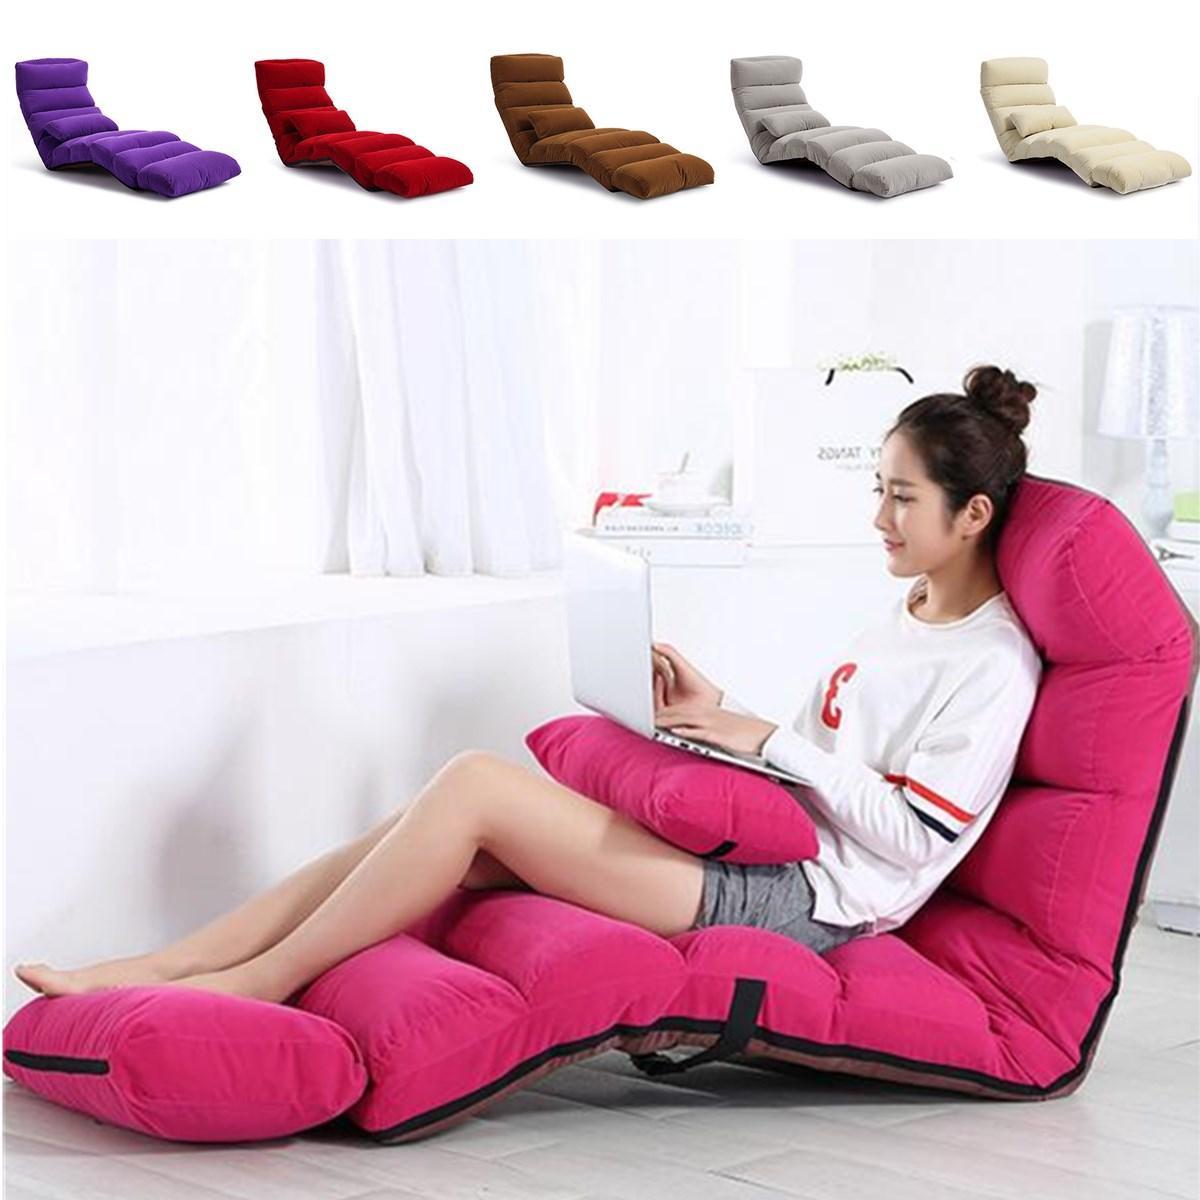 205cm 3 Folding Lazy Sofa Chair